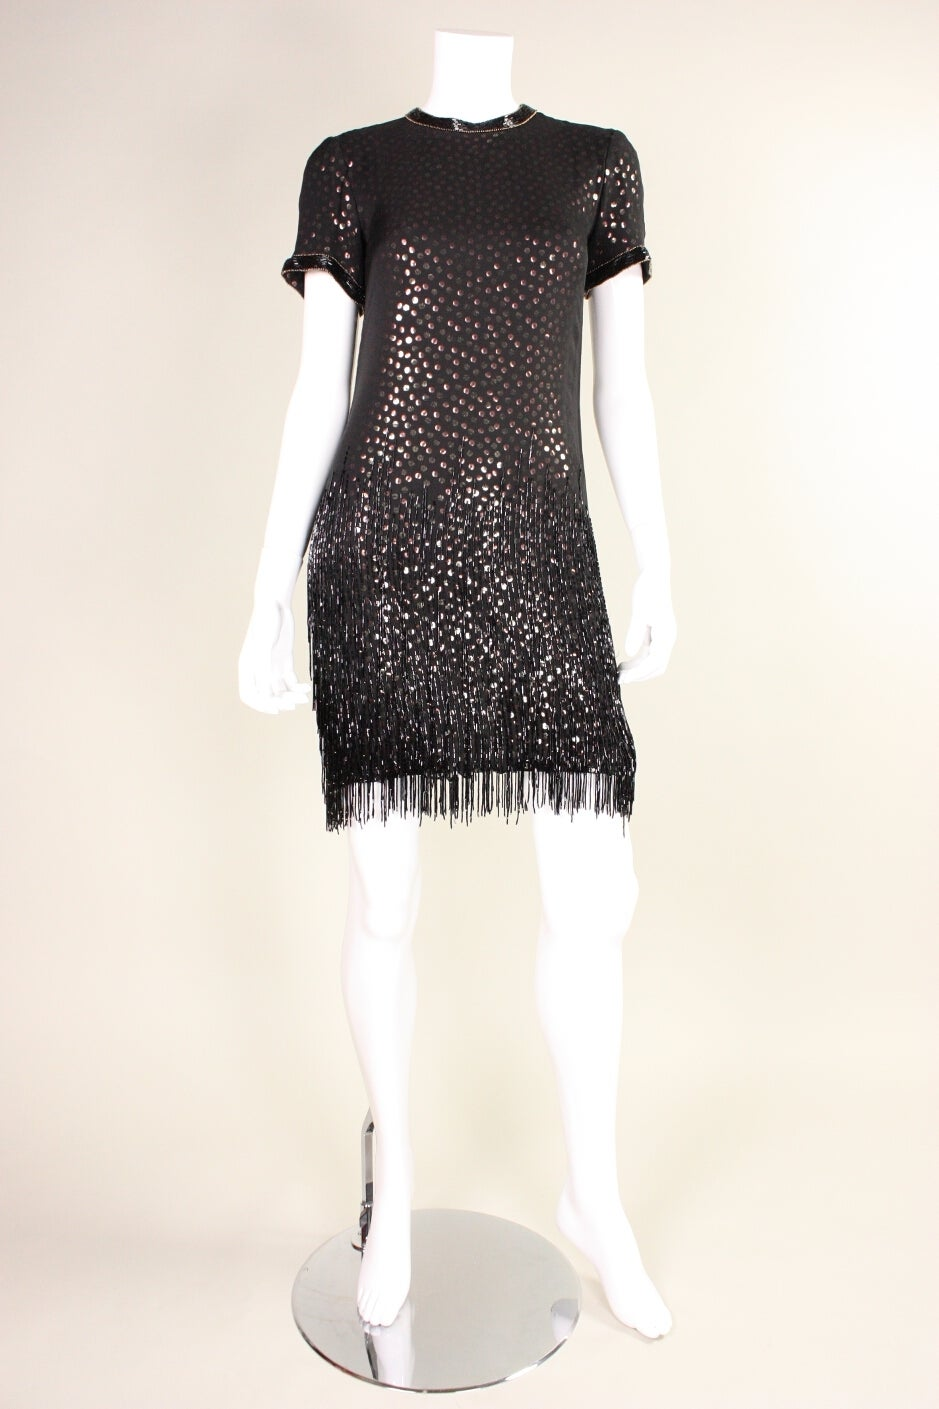 1980s Bob Mackie Sequined Dress with Beaded Fringe 2